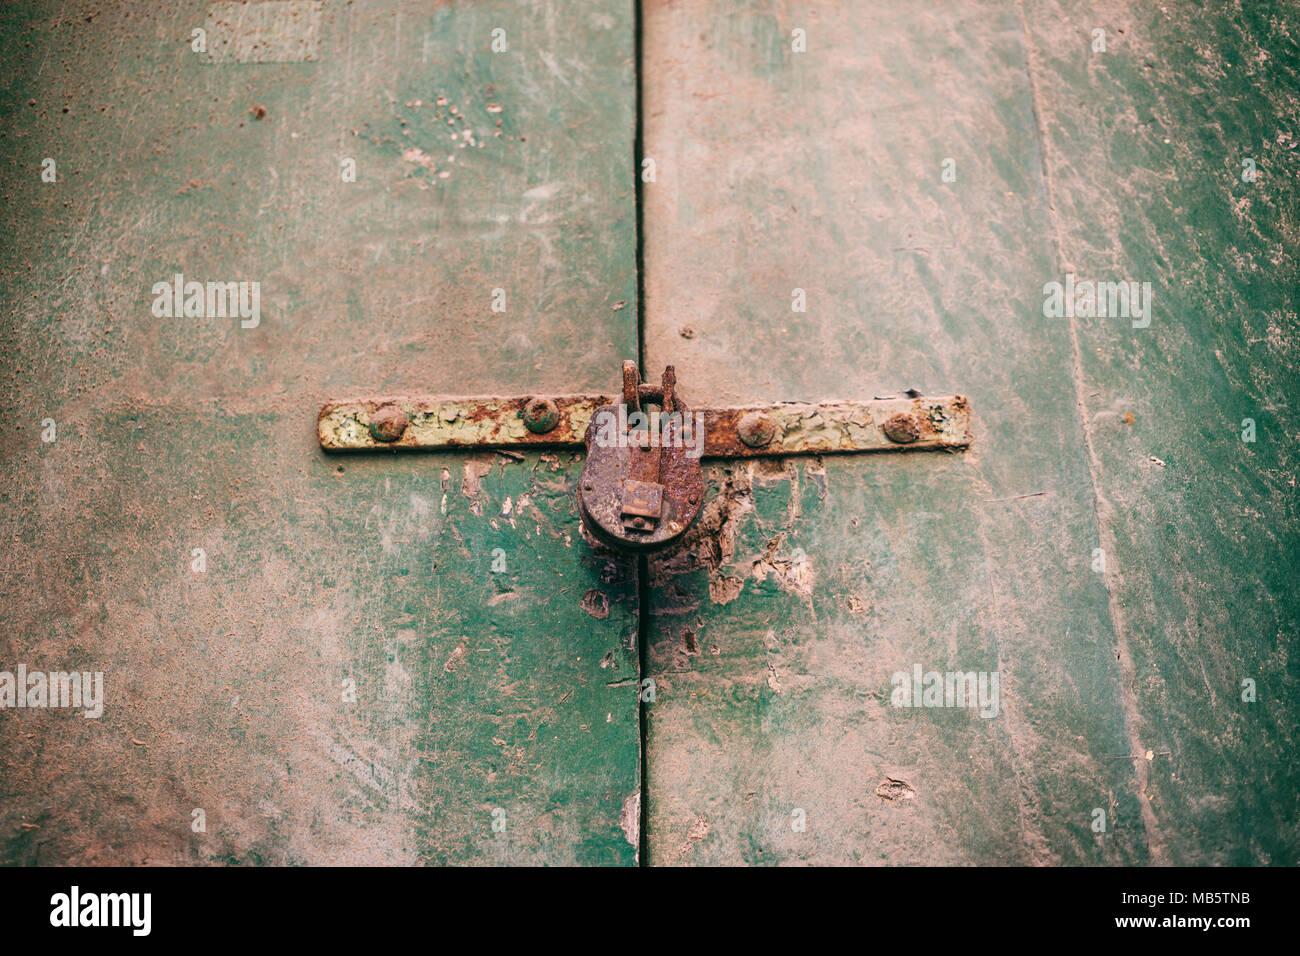 Locked door. Closed old rusty padlock on a damaged wooden door, closeup view Stock Photo